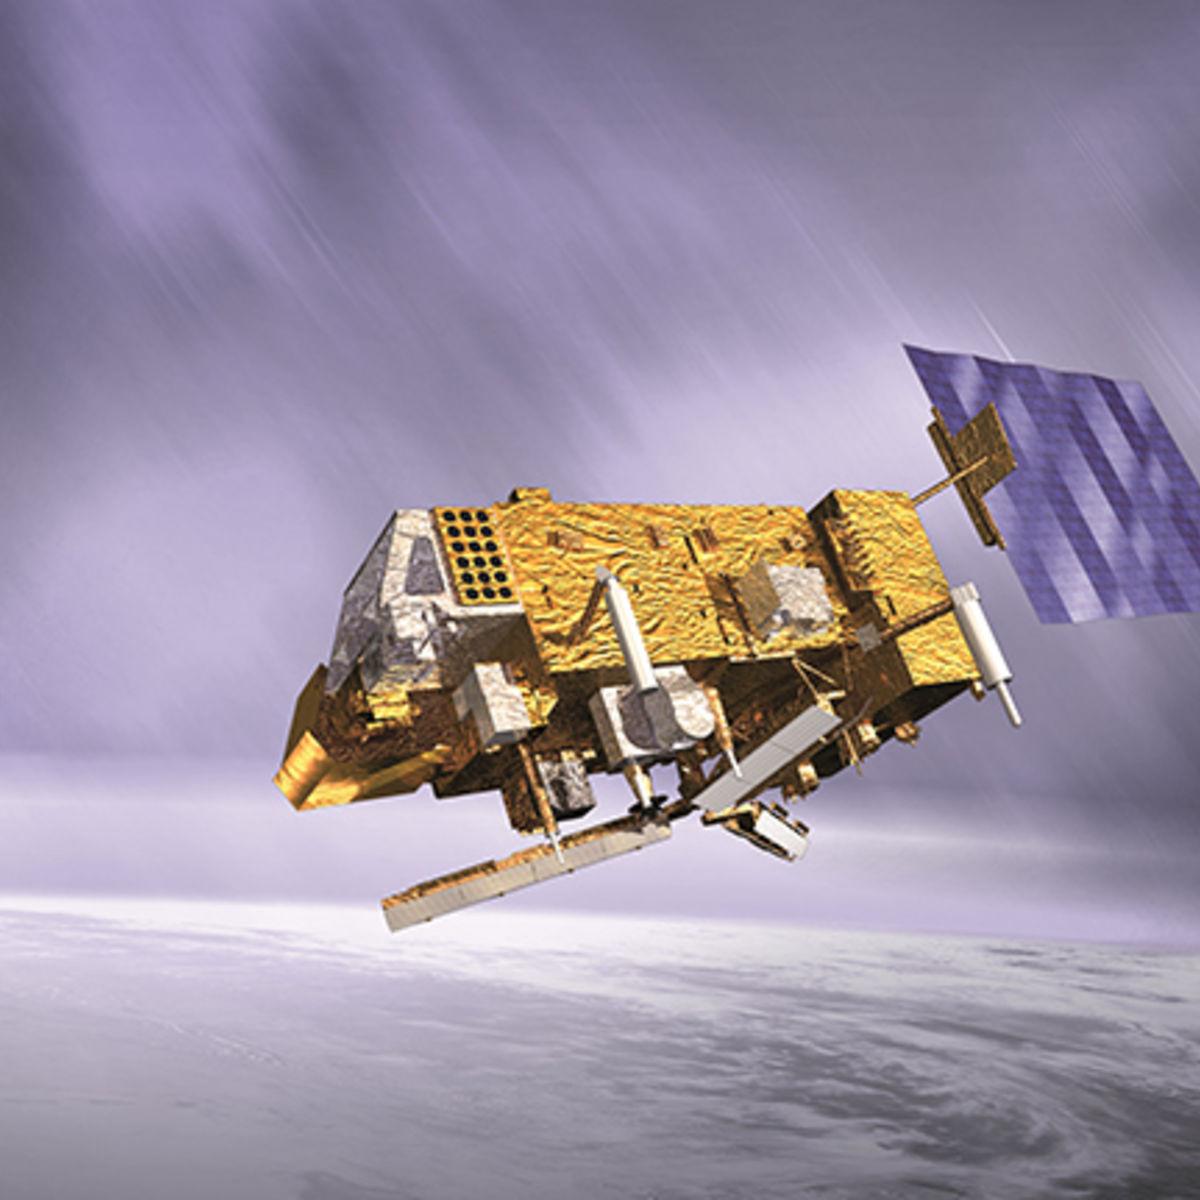 metop-b_satelite.jpg